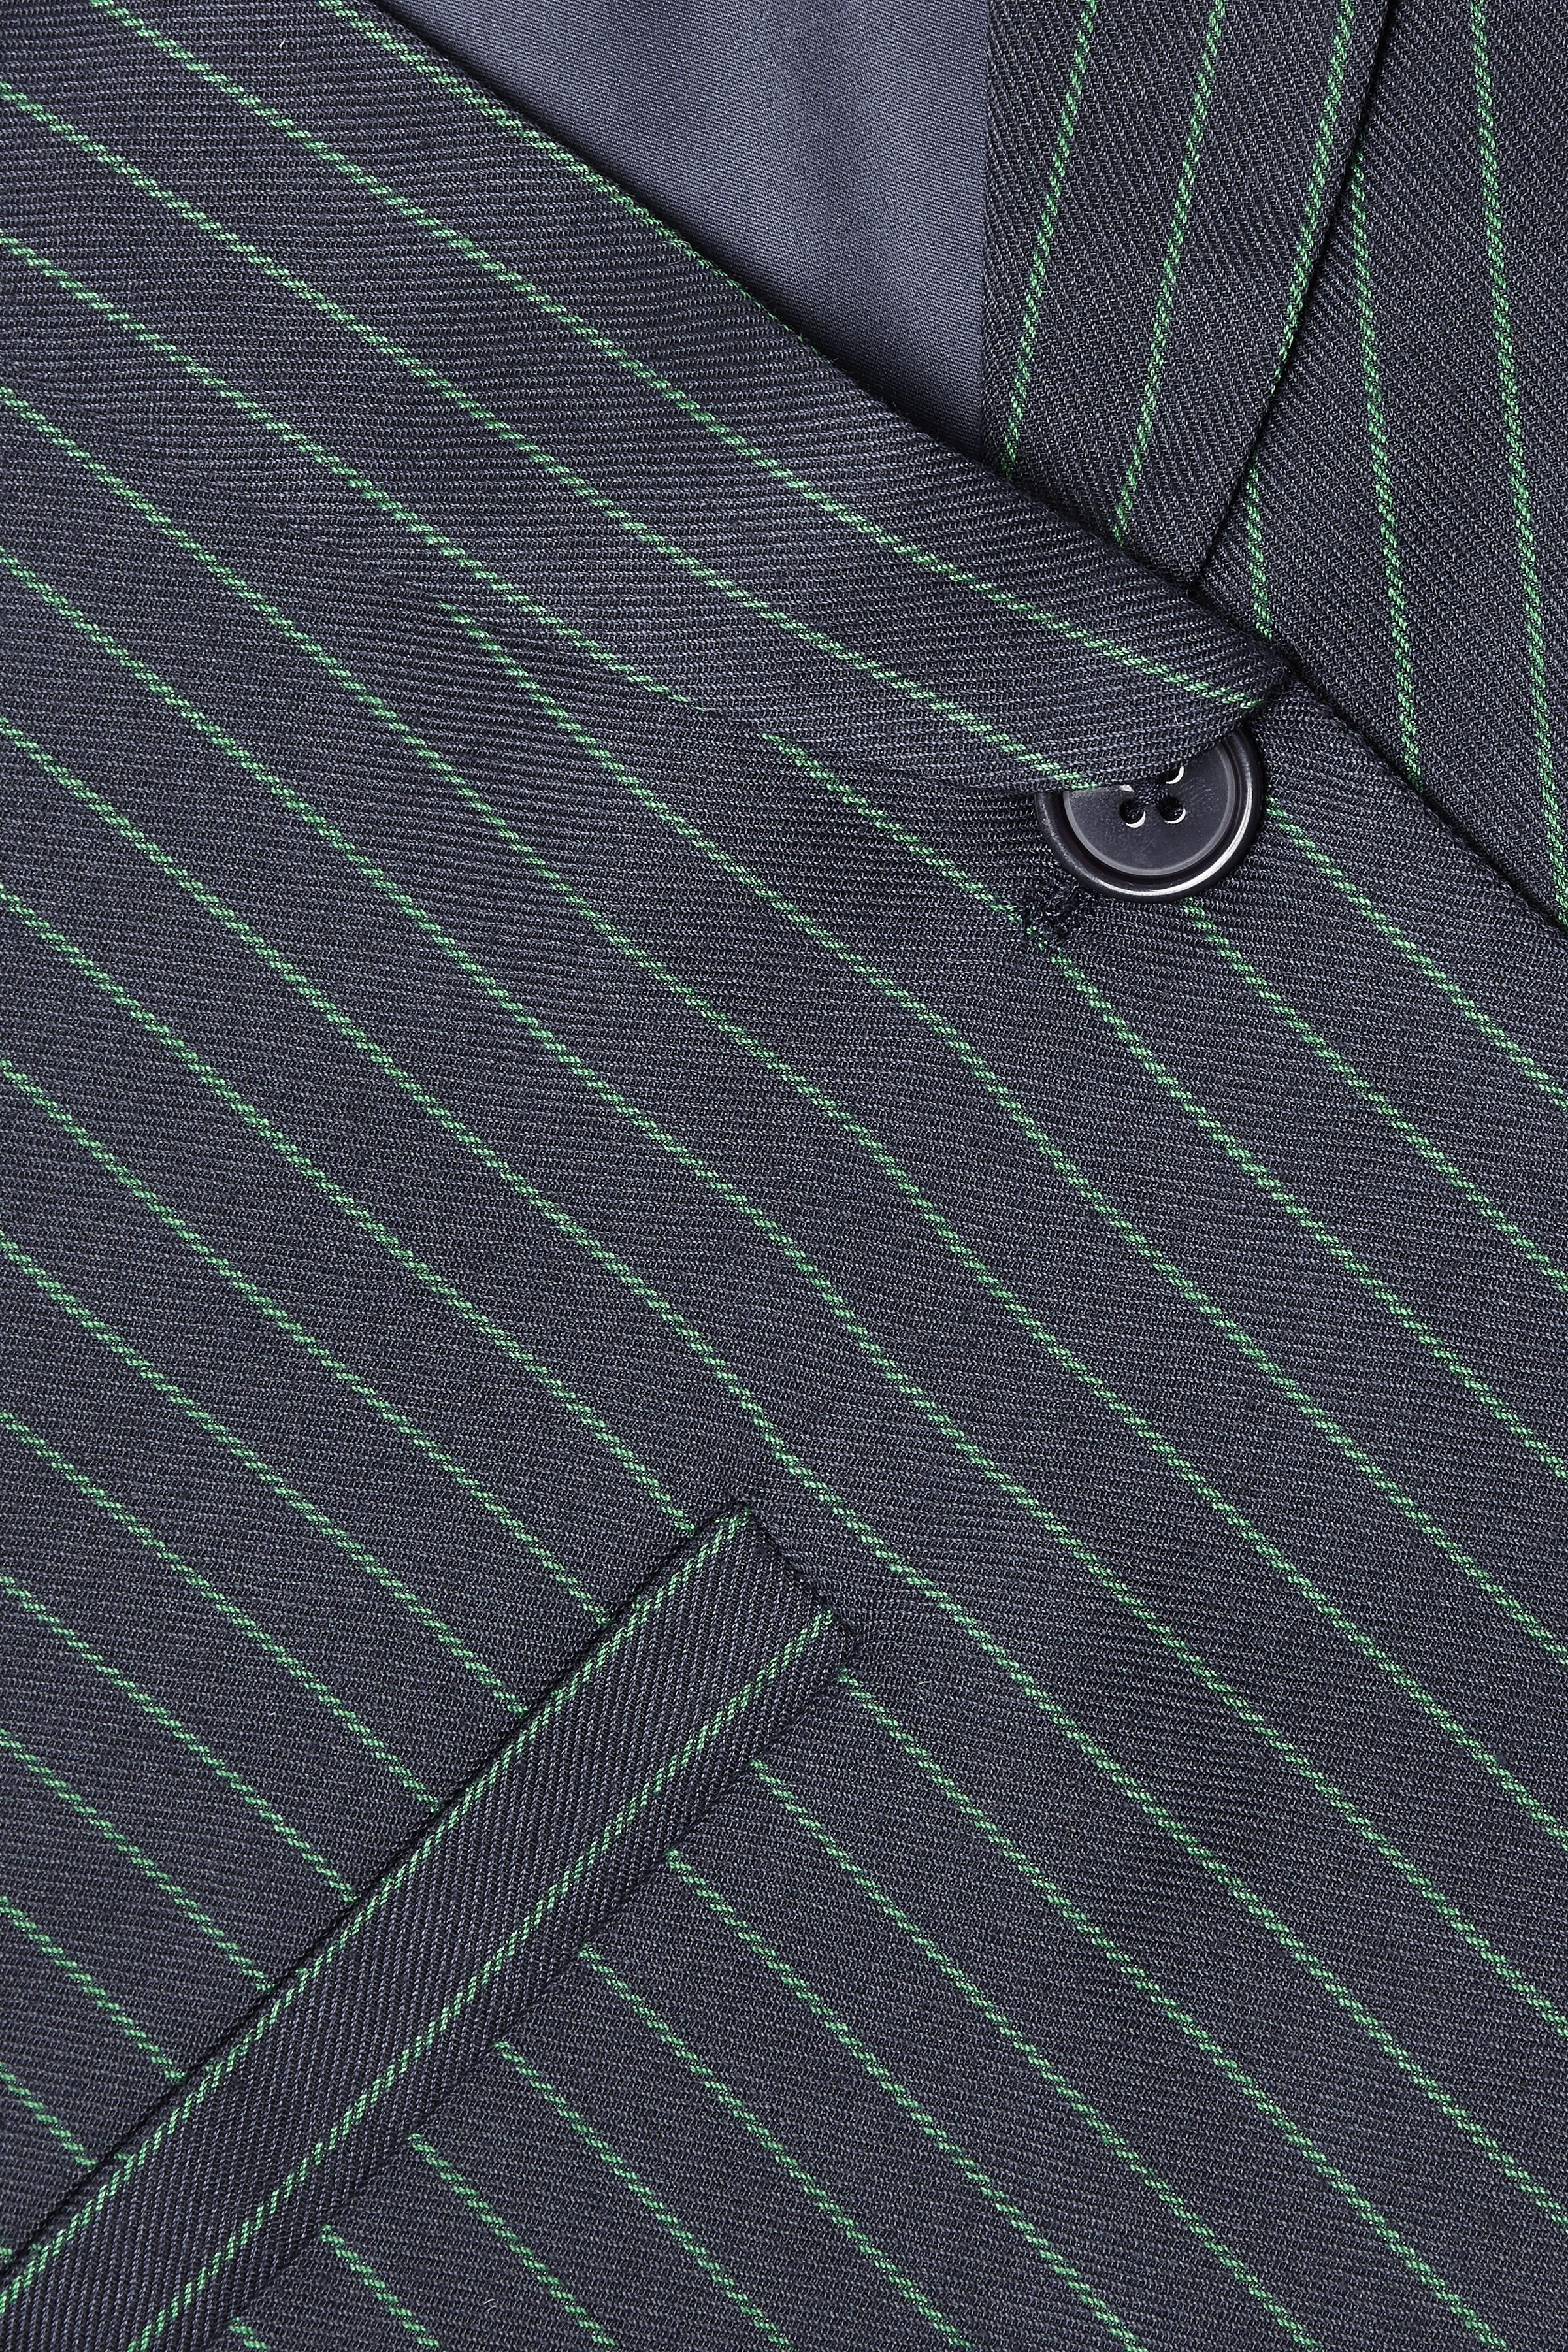 Marineblå/støvet grøn Blazer fra Kaffe – Køb Marineblå/støvet grøn Blazer fra str. 34-46 her